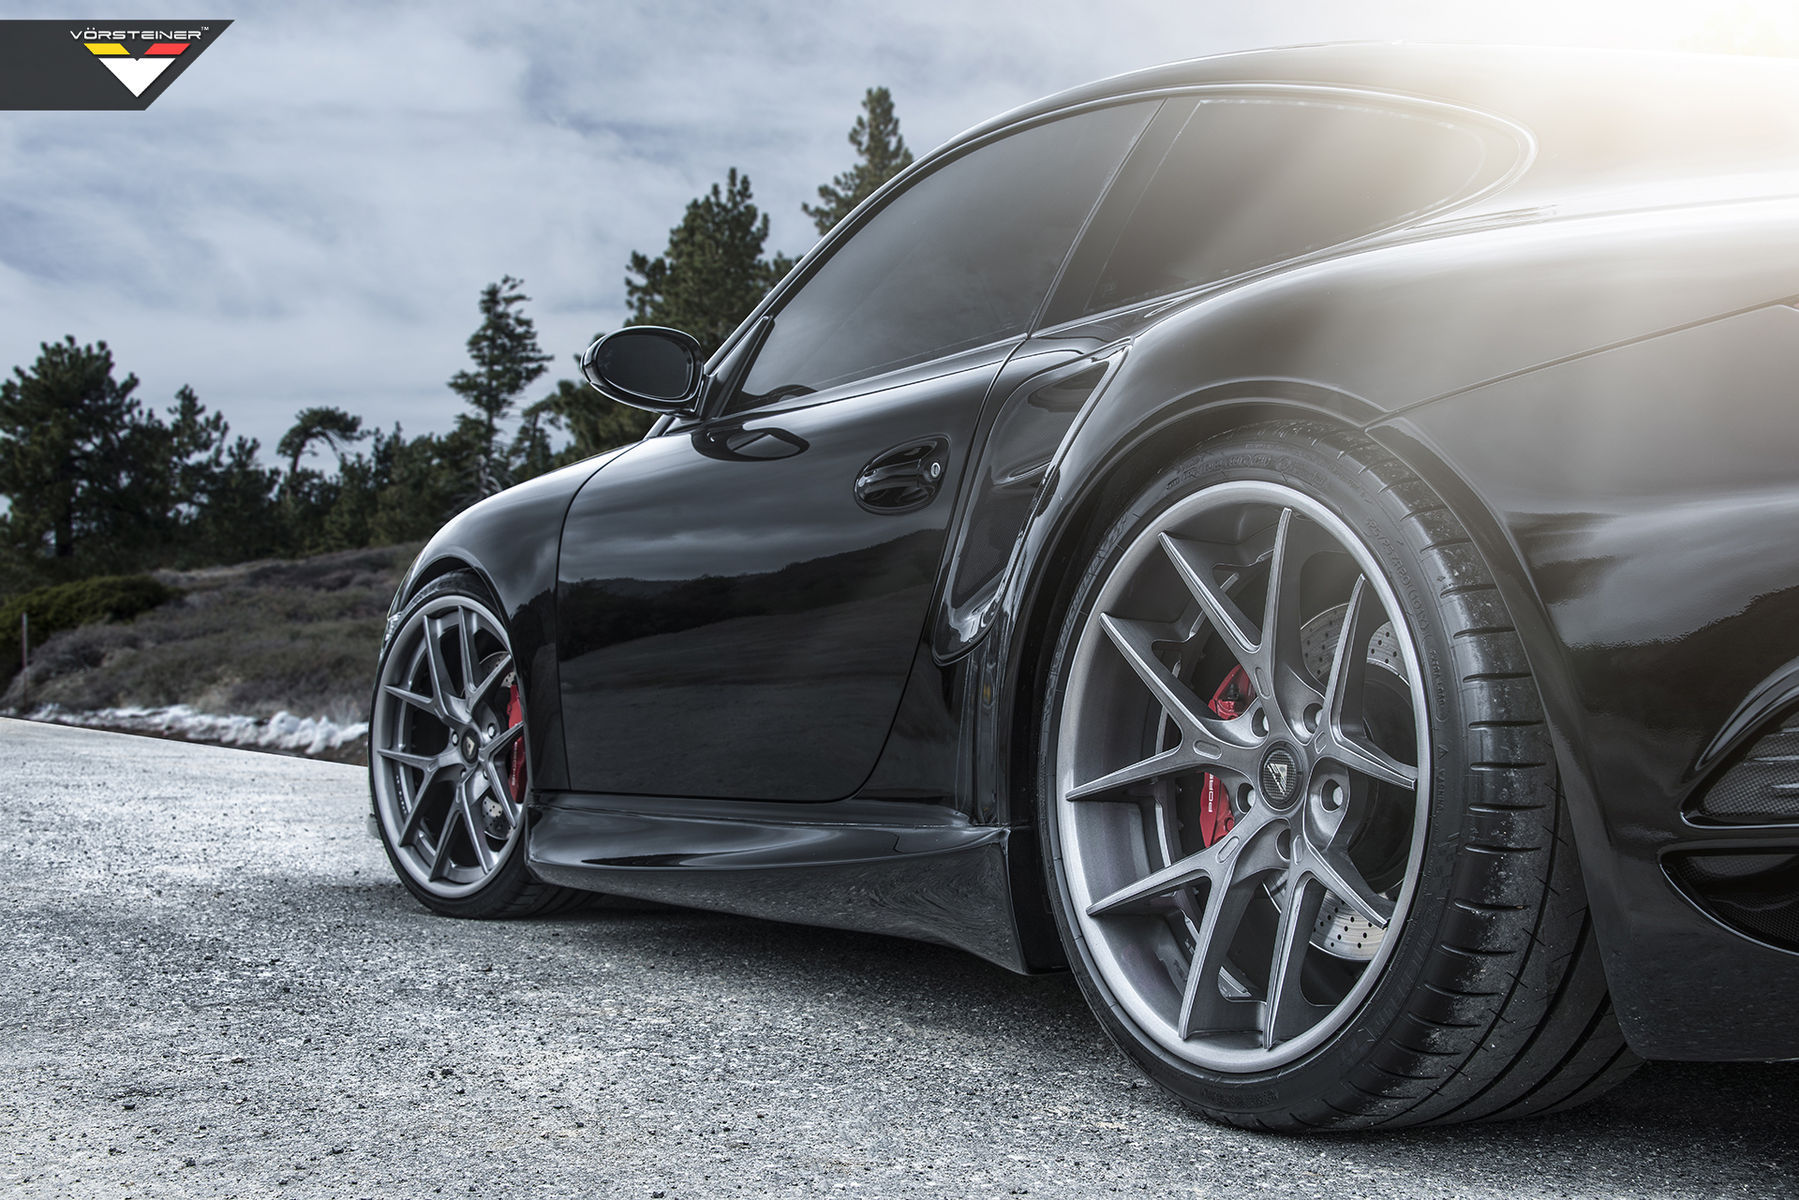 2013 Porsche Carrera GT   997 V-RT Edition Carrera Turbo